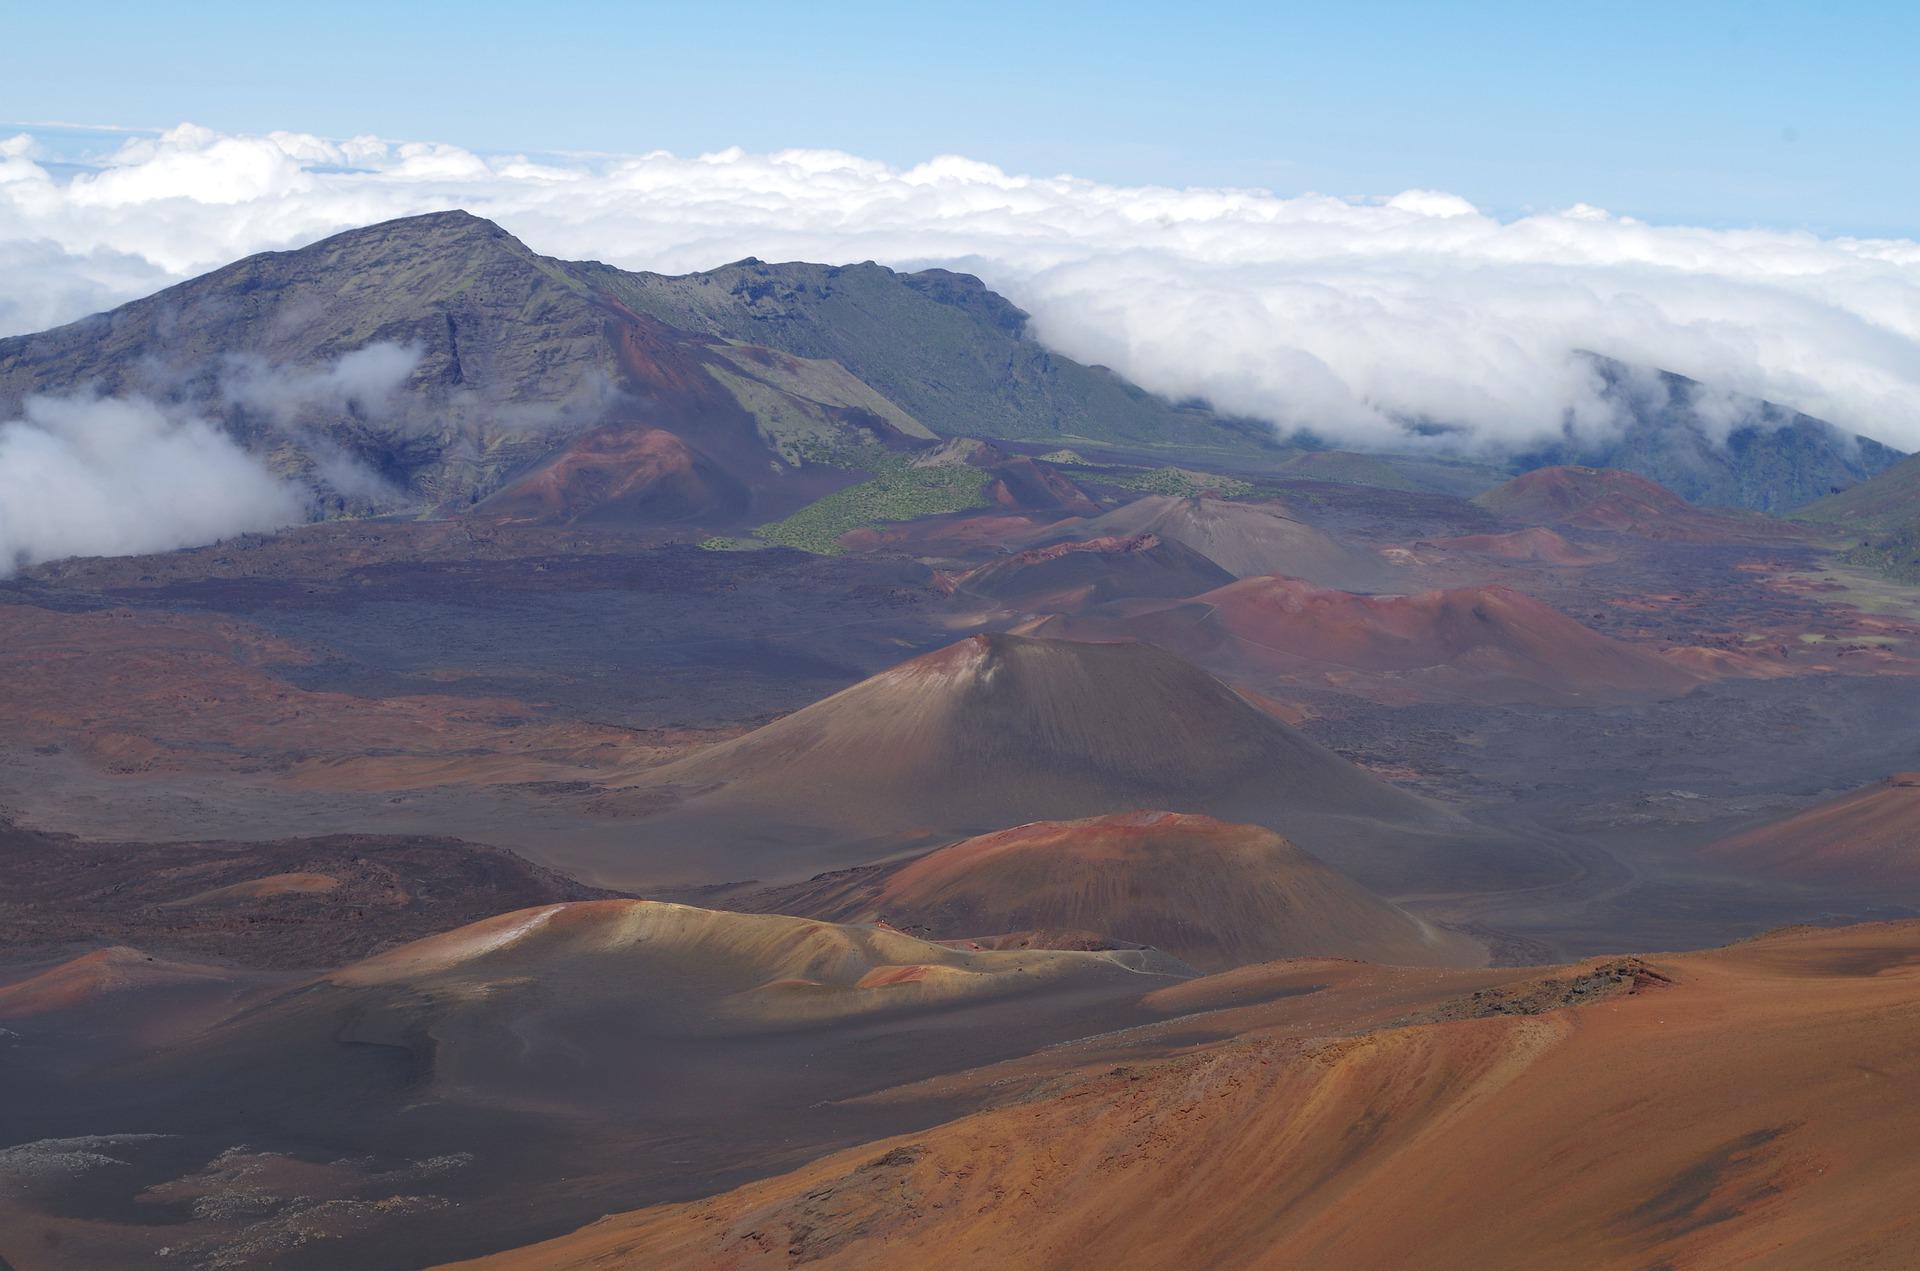 Hawaiian Explorer | Iolani Haleakalā, Maui, Hawaii